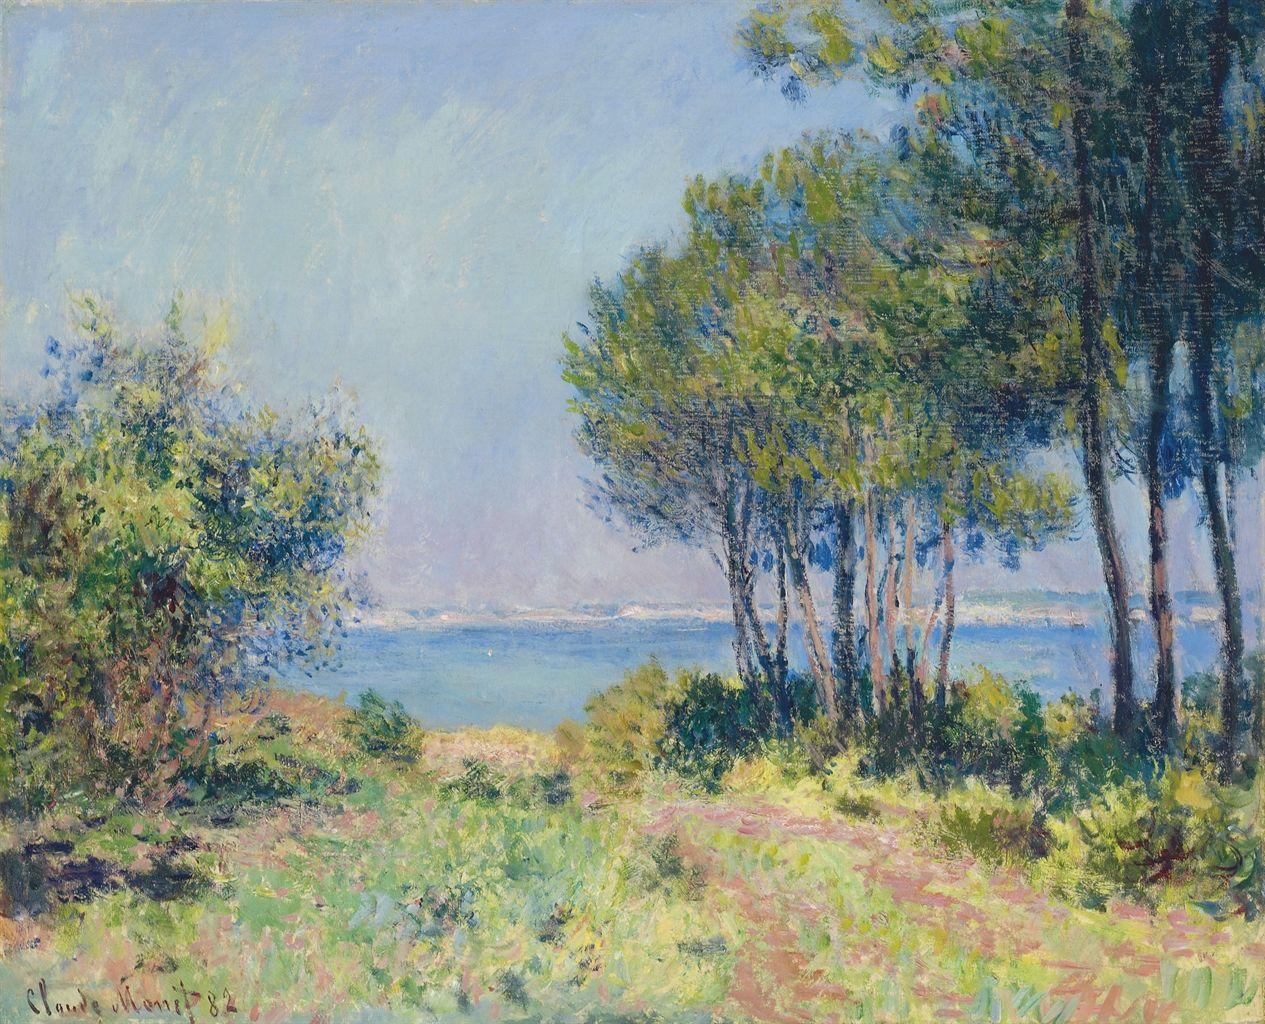 zsazsabellagio | Monet art, Claude monet art, Monet paintings